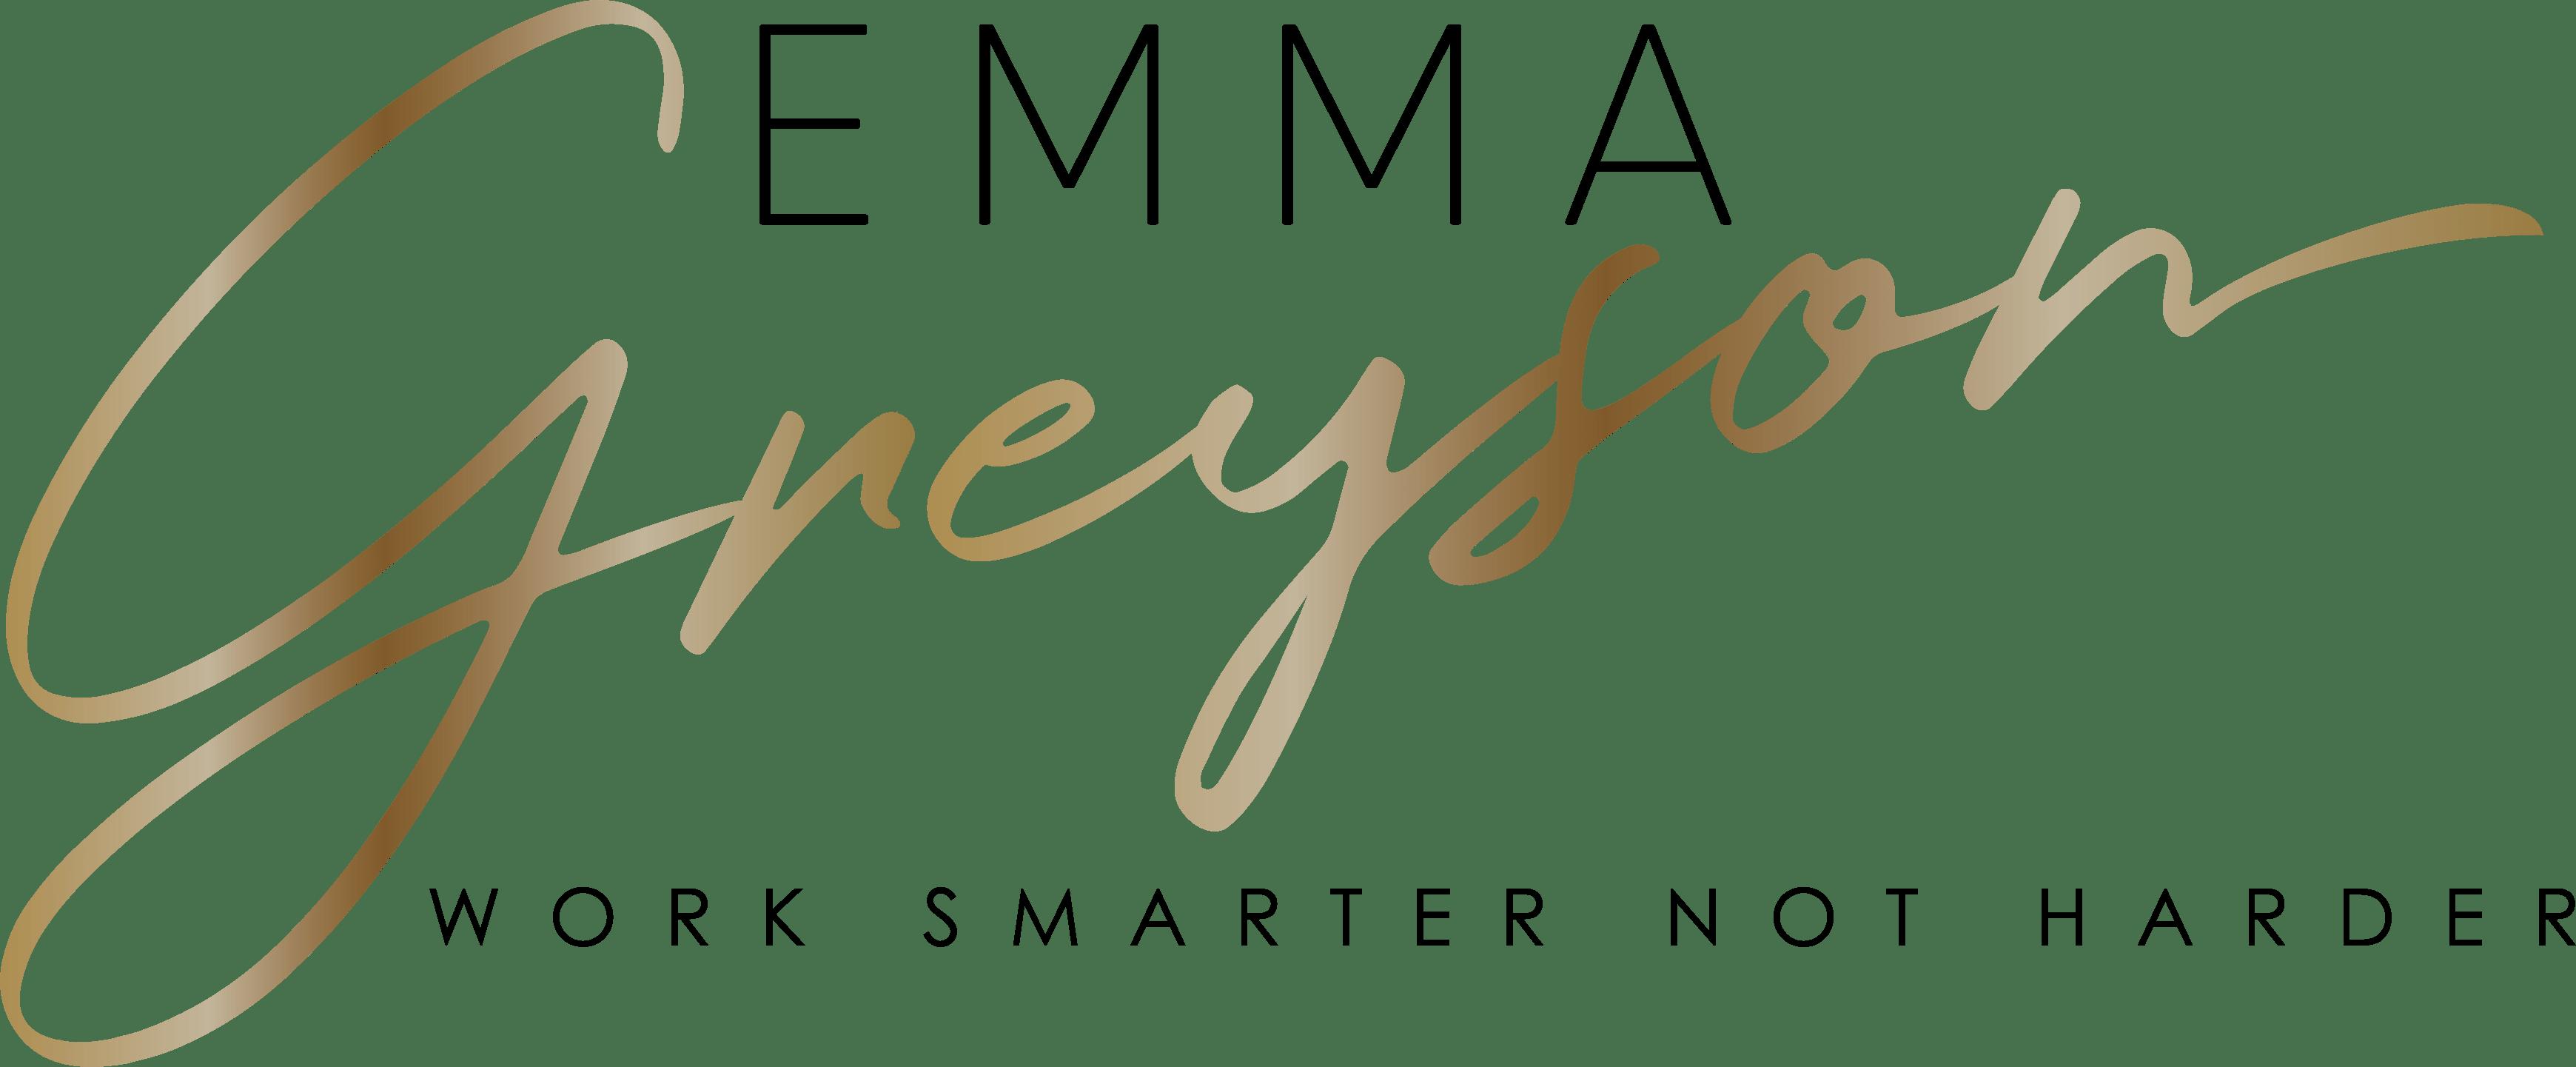 EmmaGreyson.com